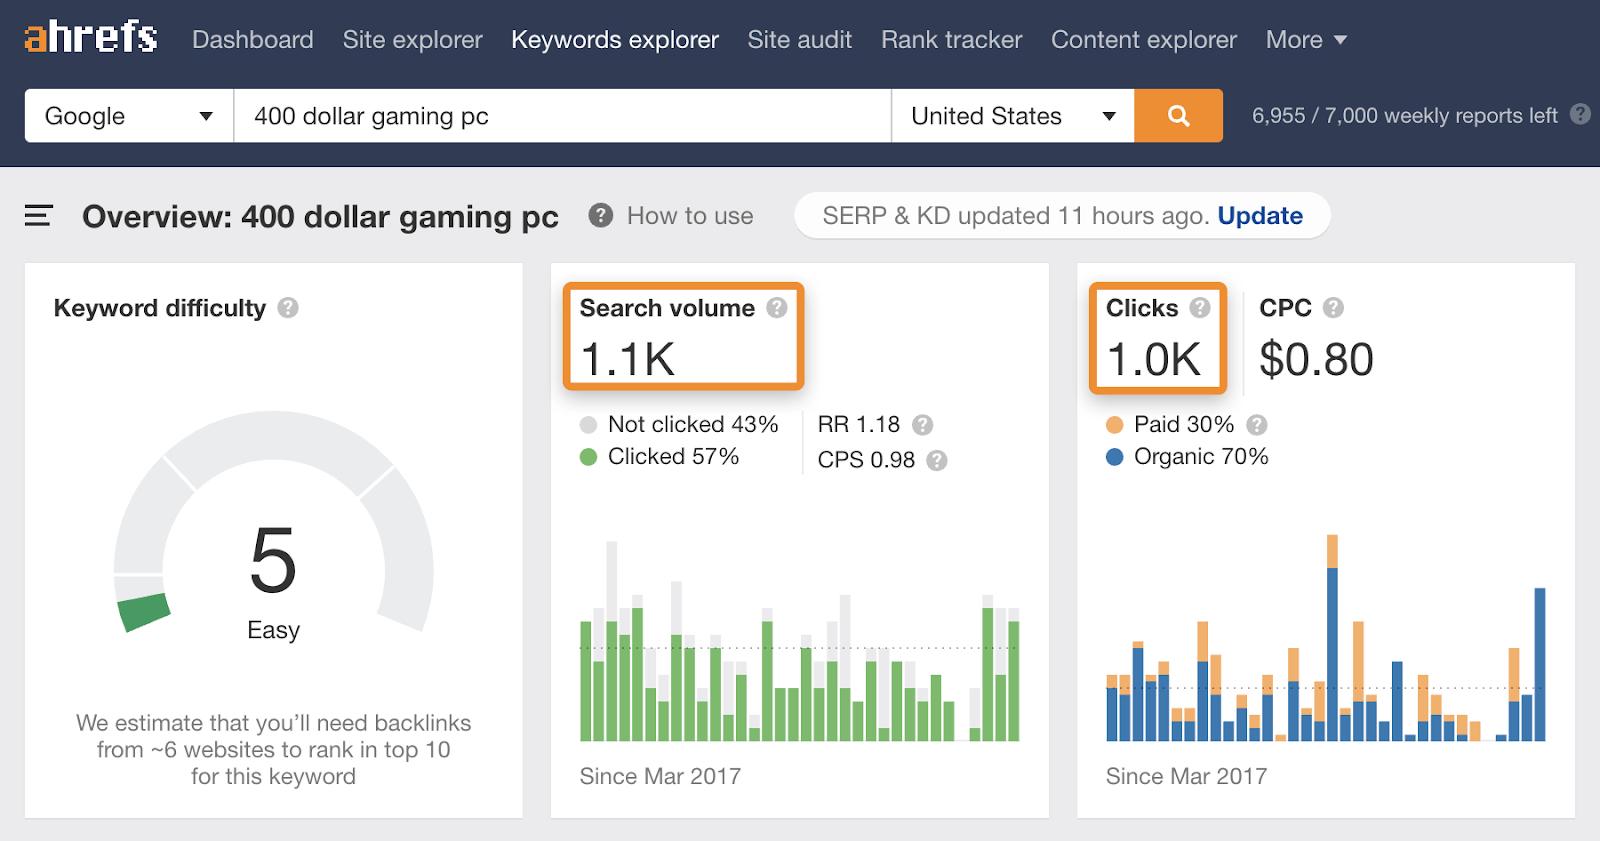 25 400 dolloar gaming pc traffic potential